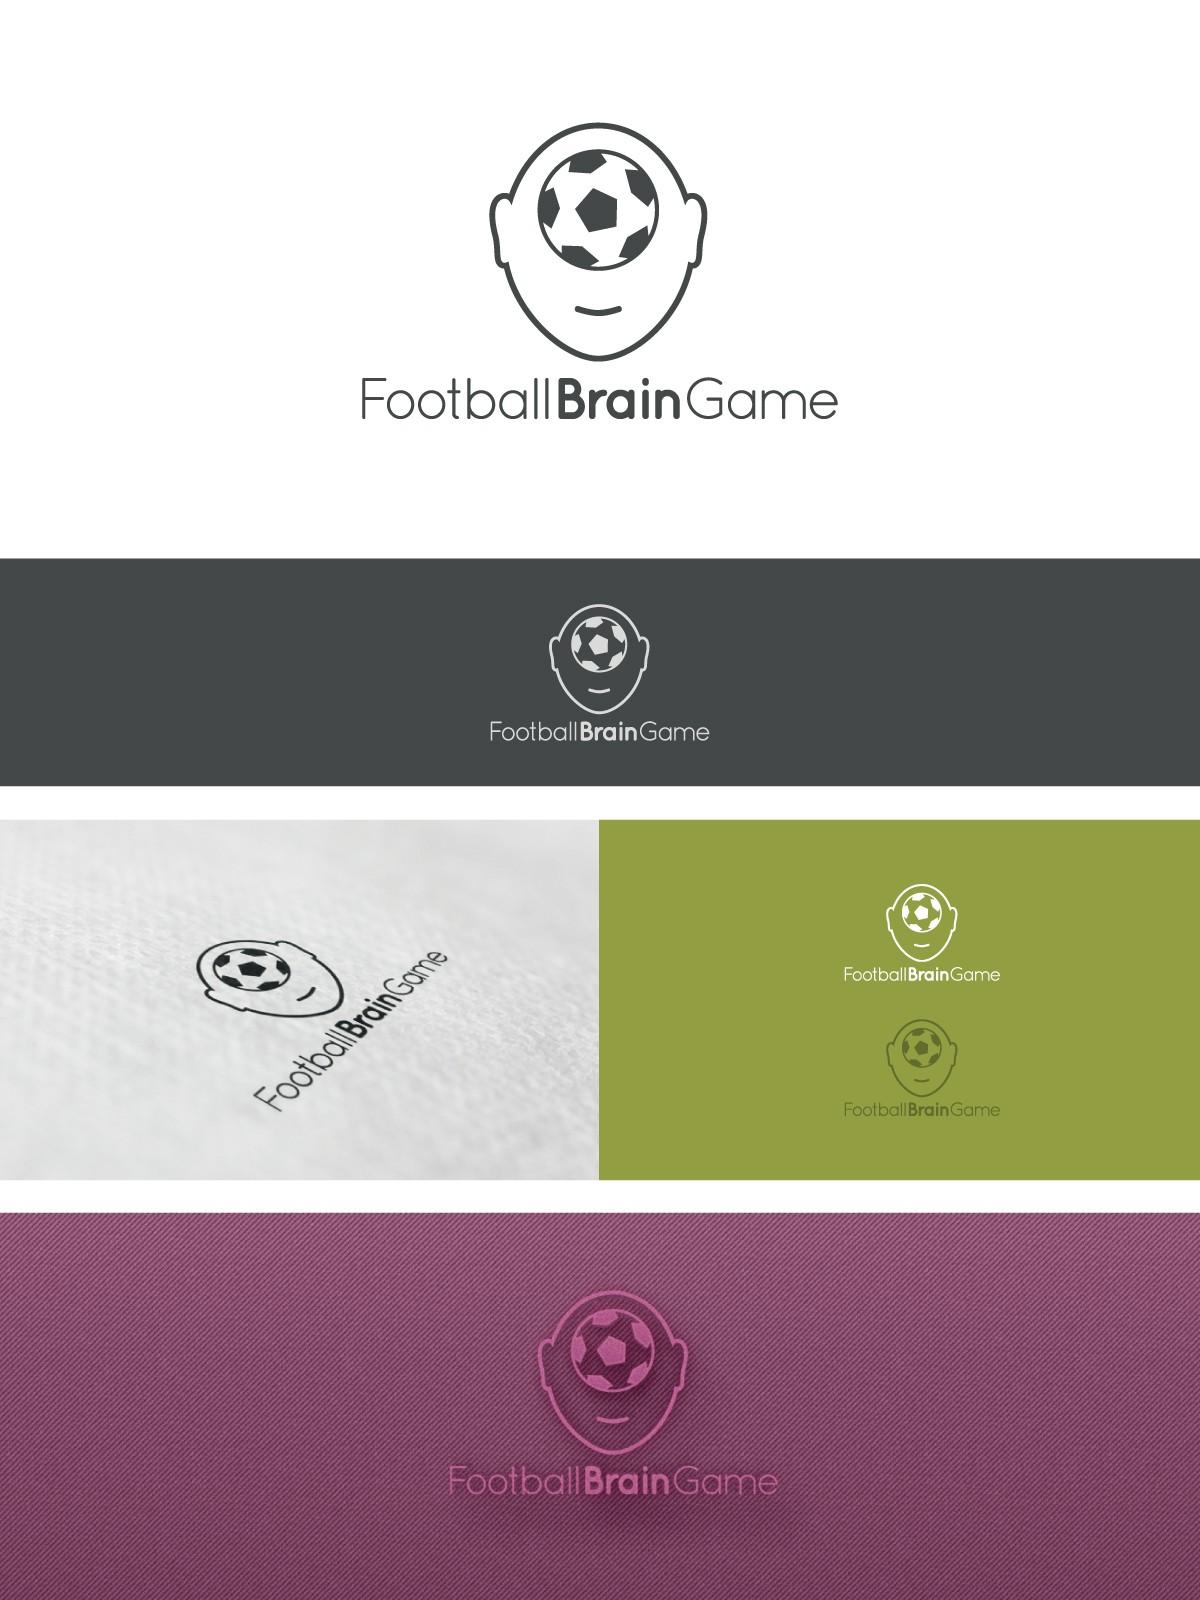 Football Brain Game needs a new logo